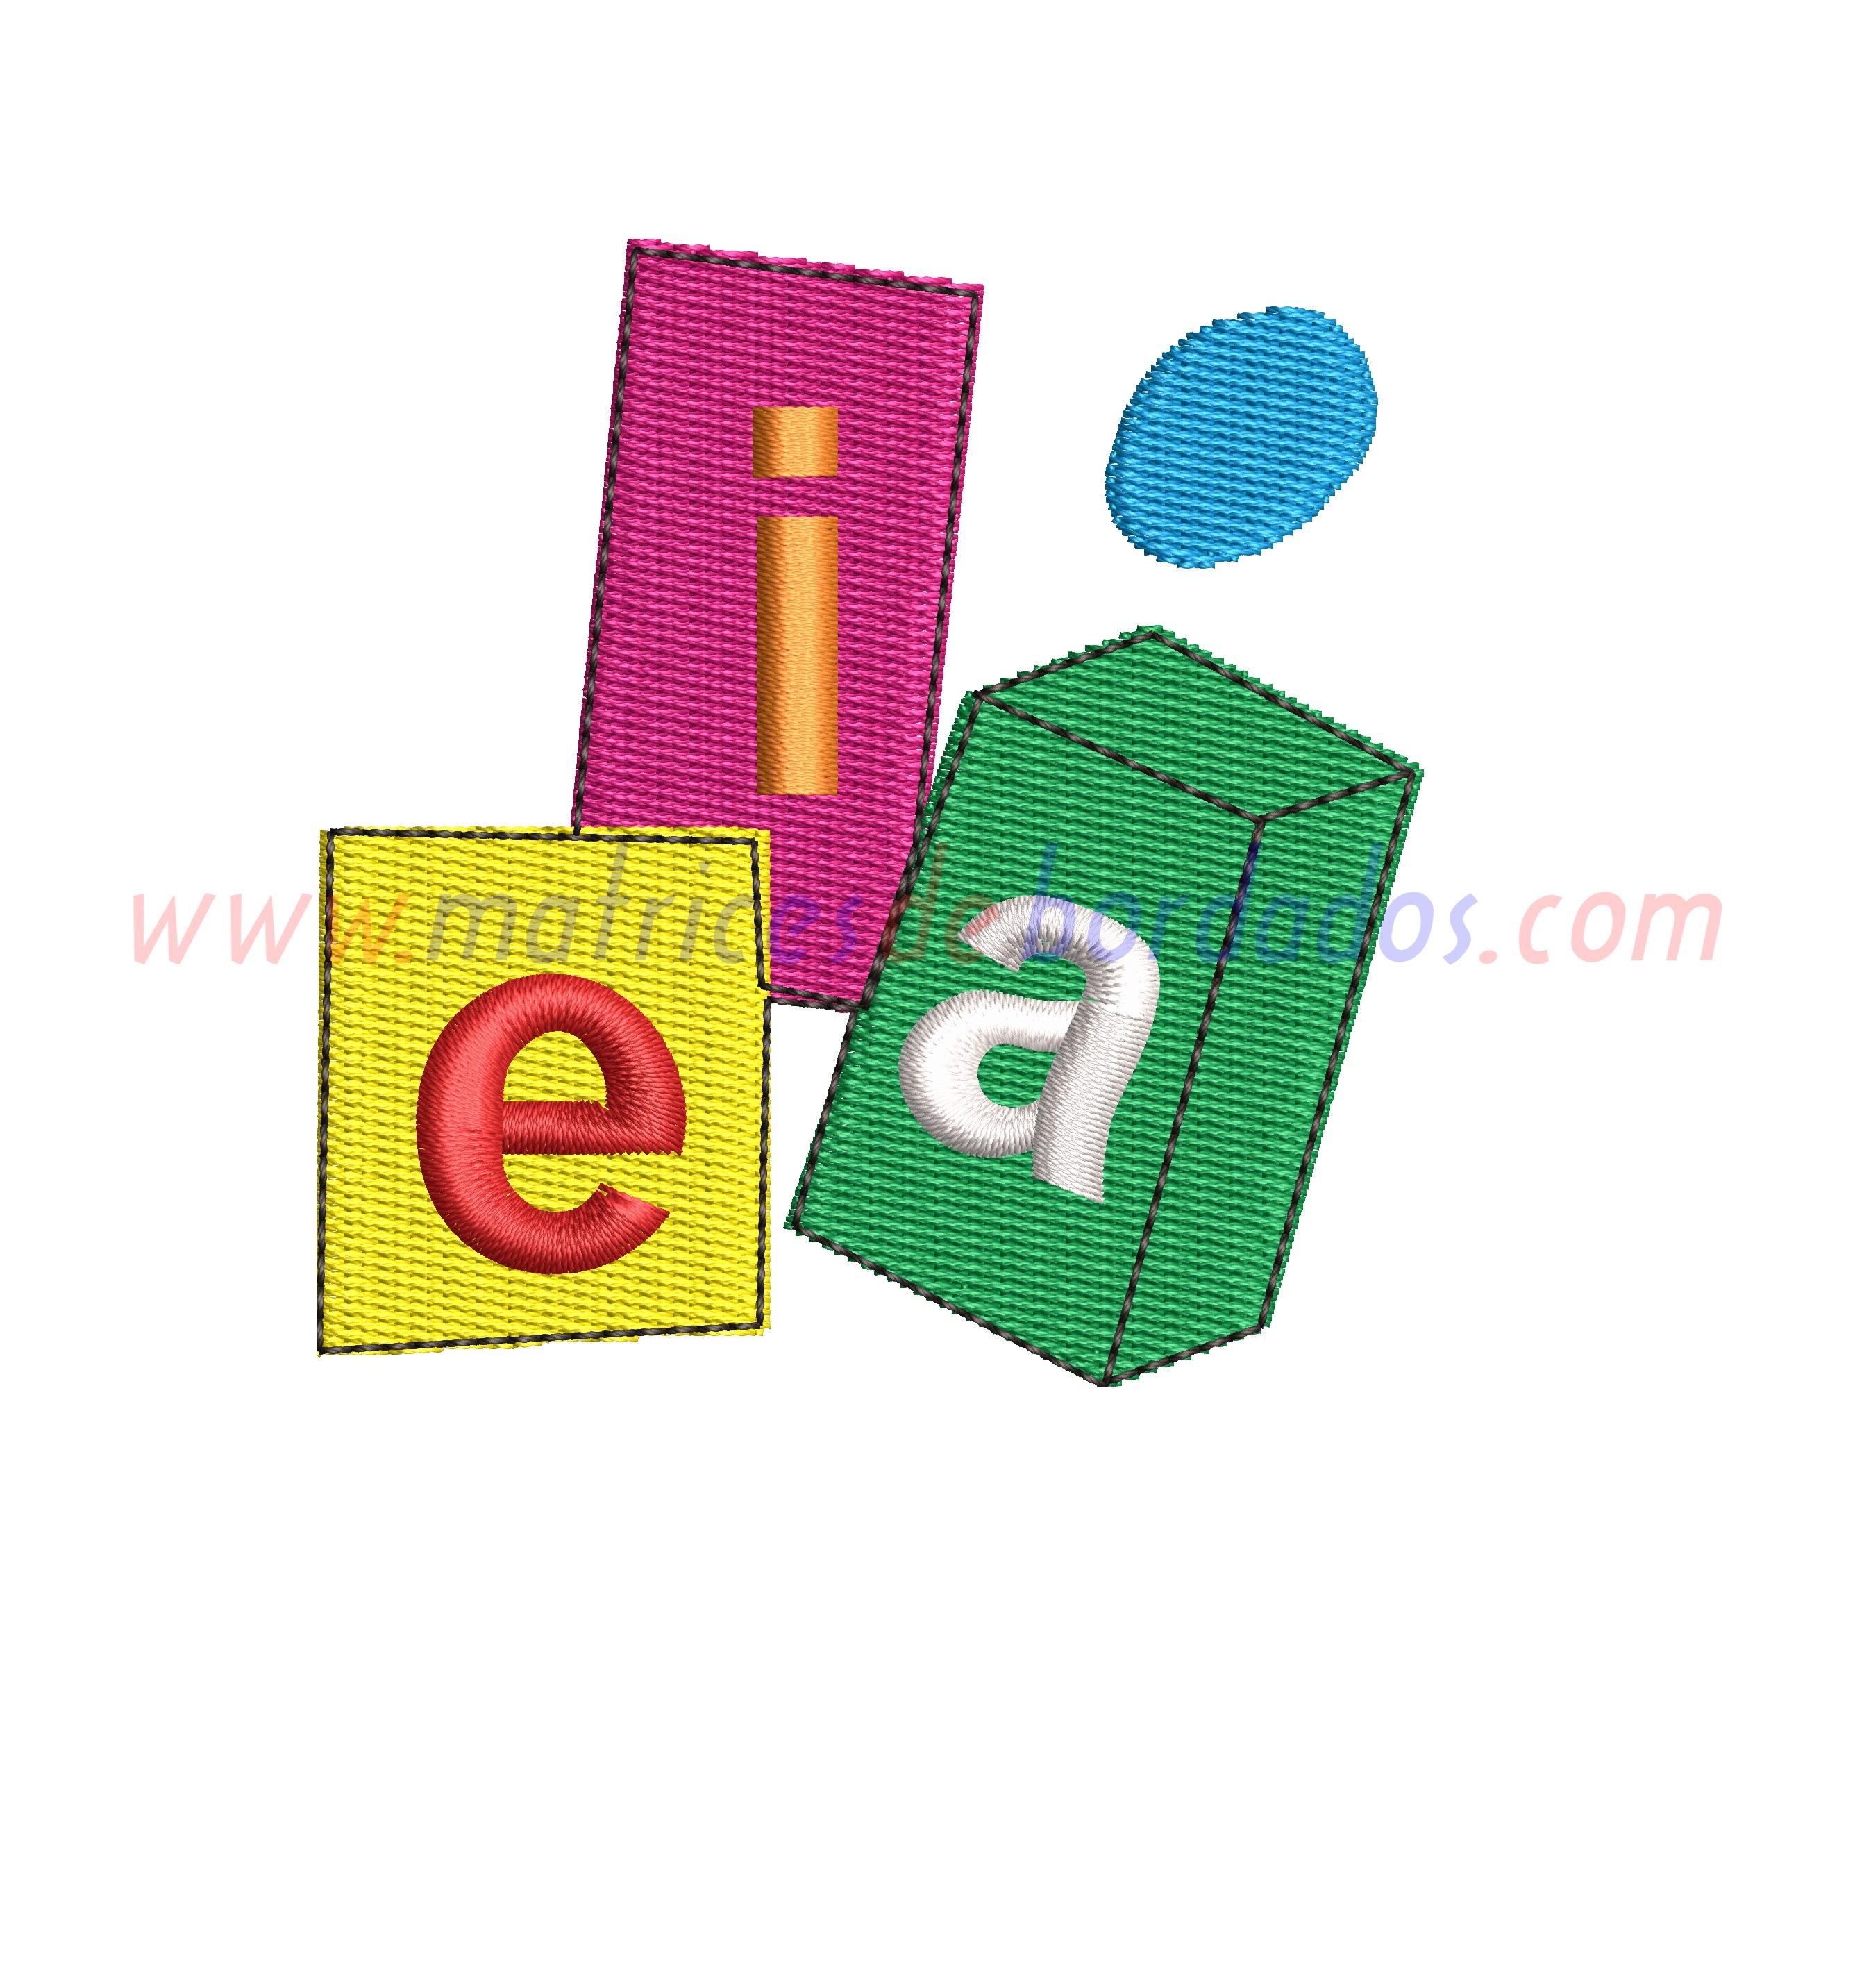 EK31XP - Aei